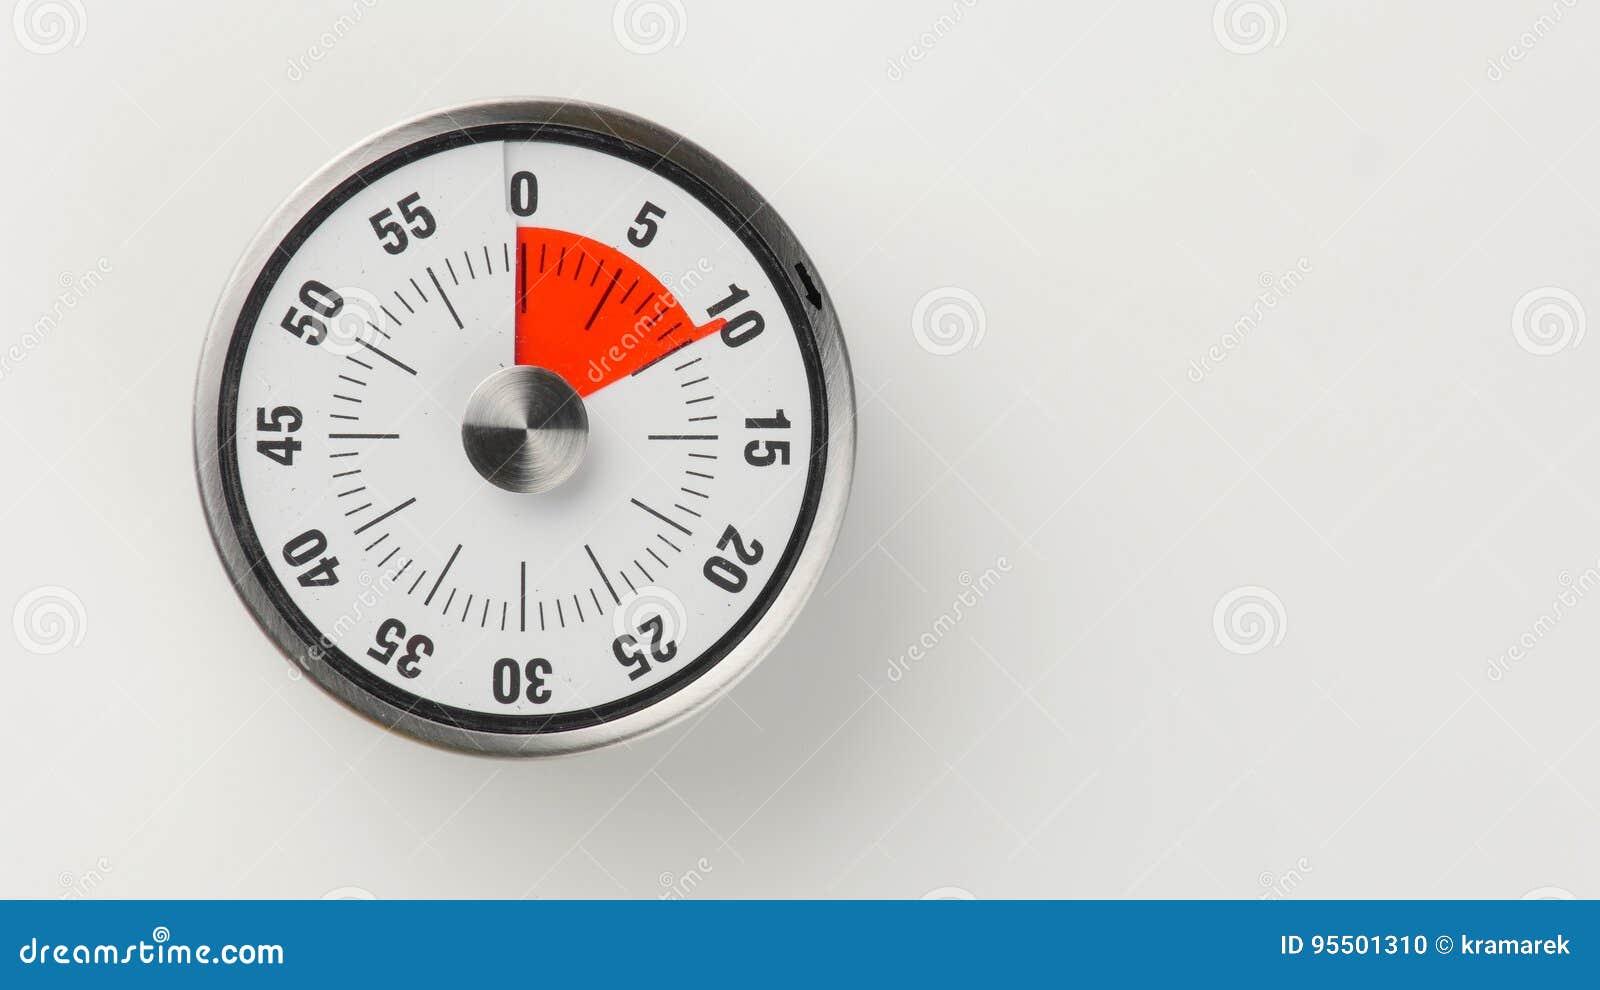 Vintage Analog Kitchen Countdown Timer, 10 Minutes Remaining Stock